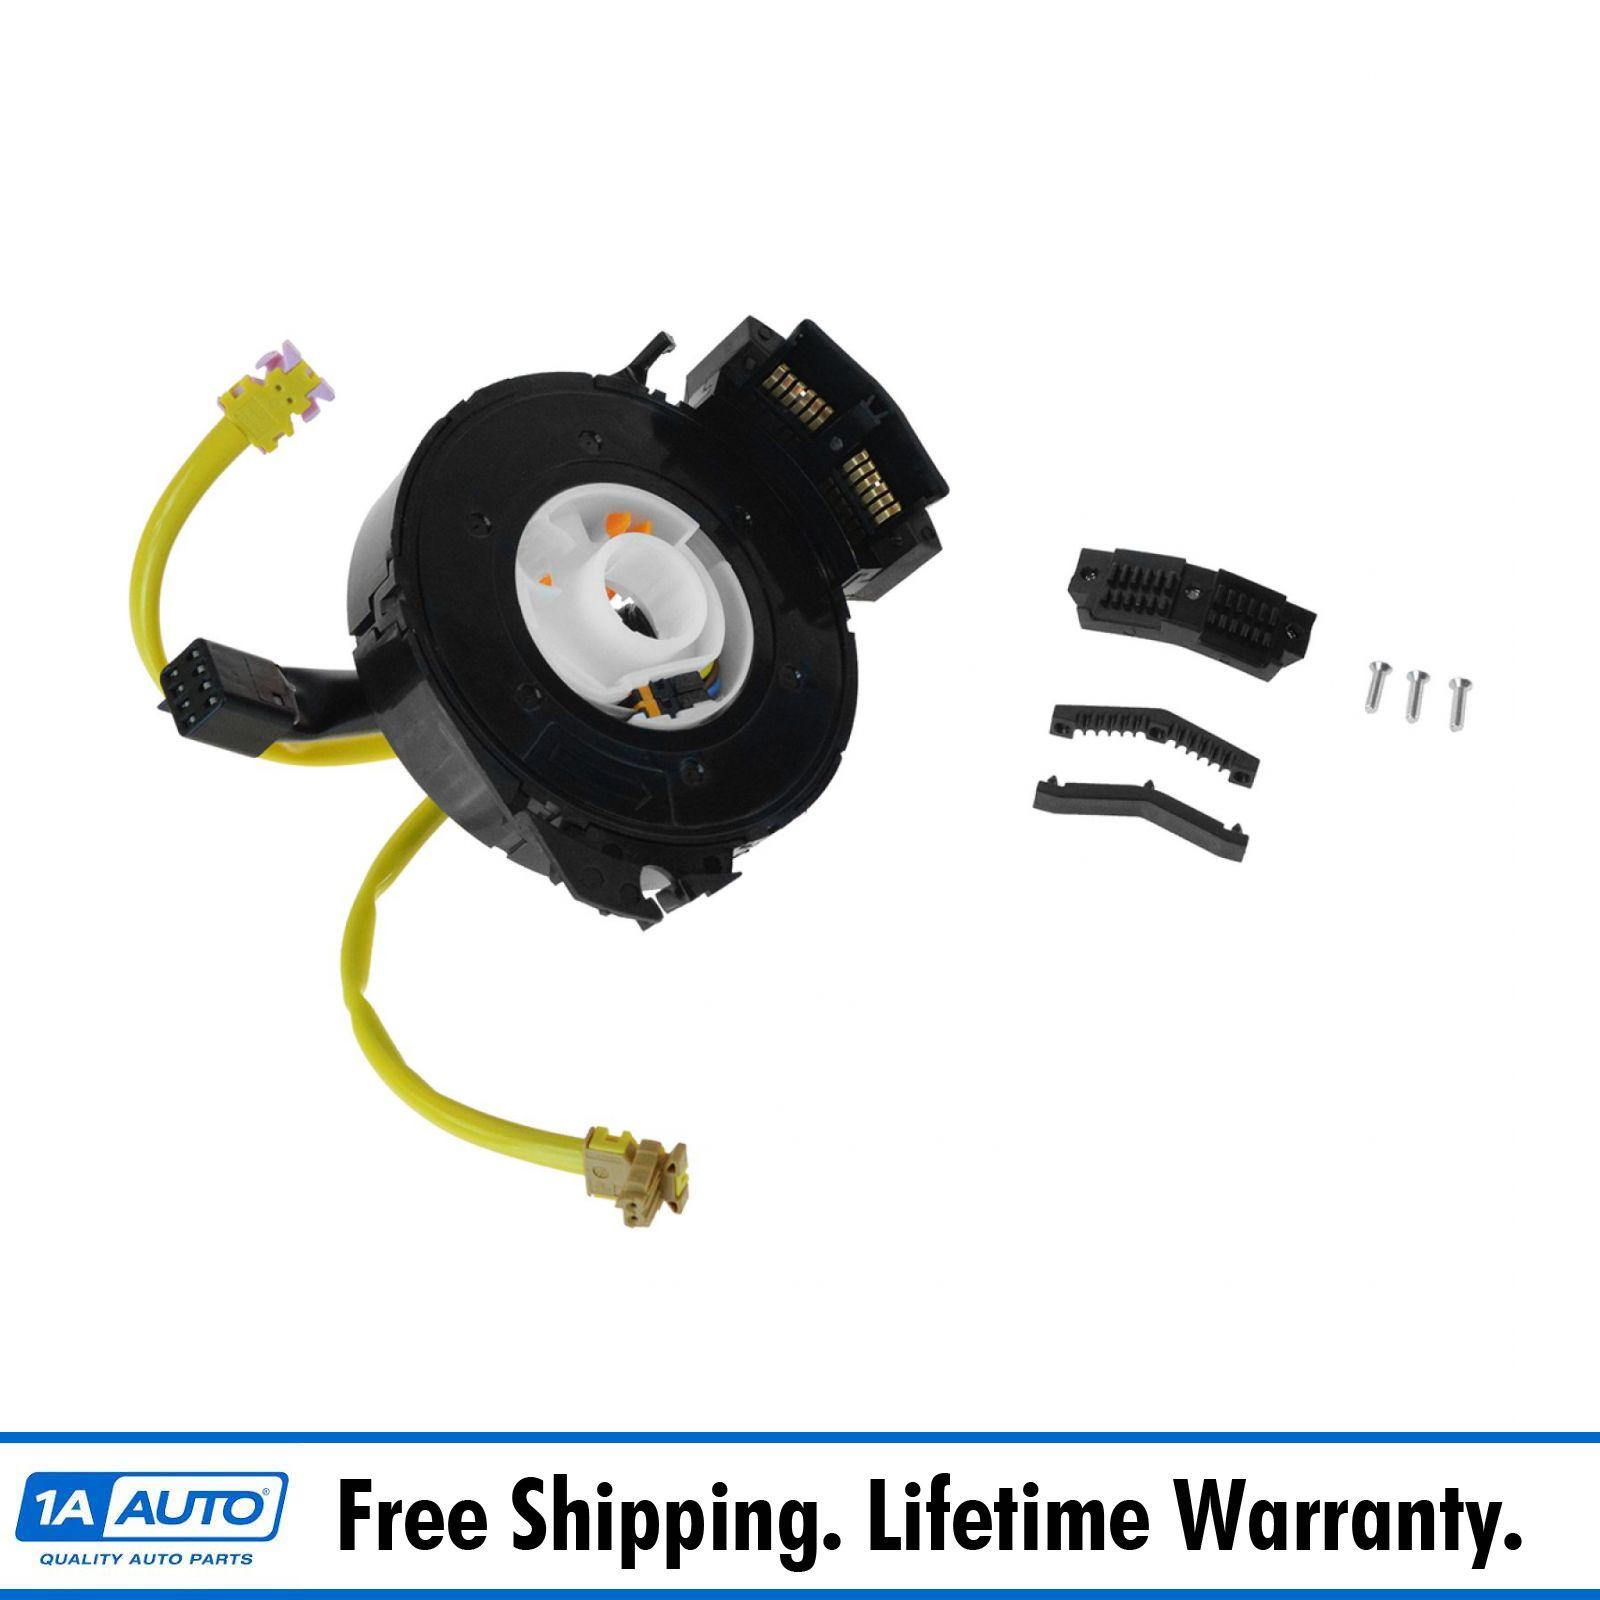 Dorman Airbag Clock Spring Clockspring For Chevy Gmc Silverado Wiring Sierra Yukon Uk3